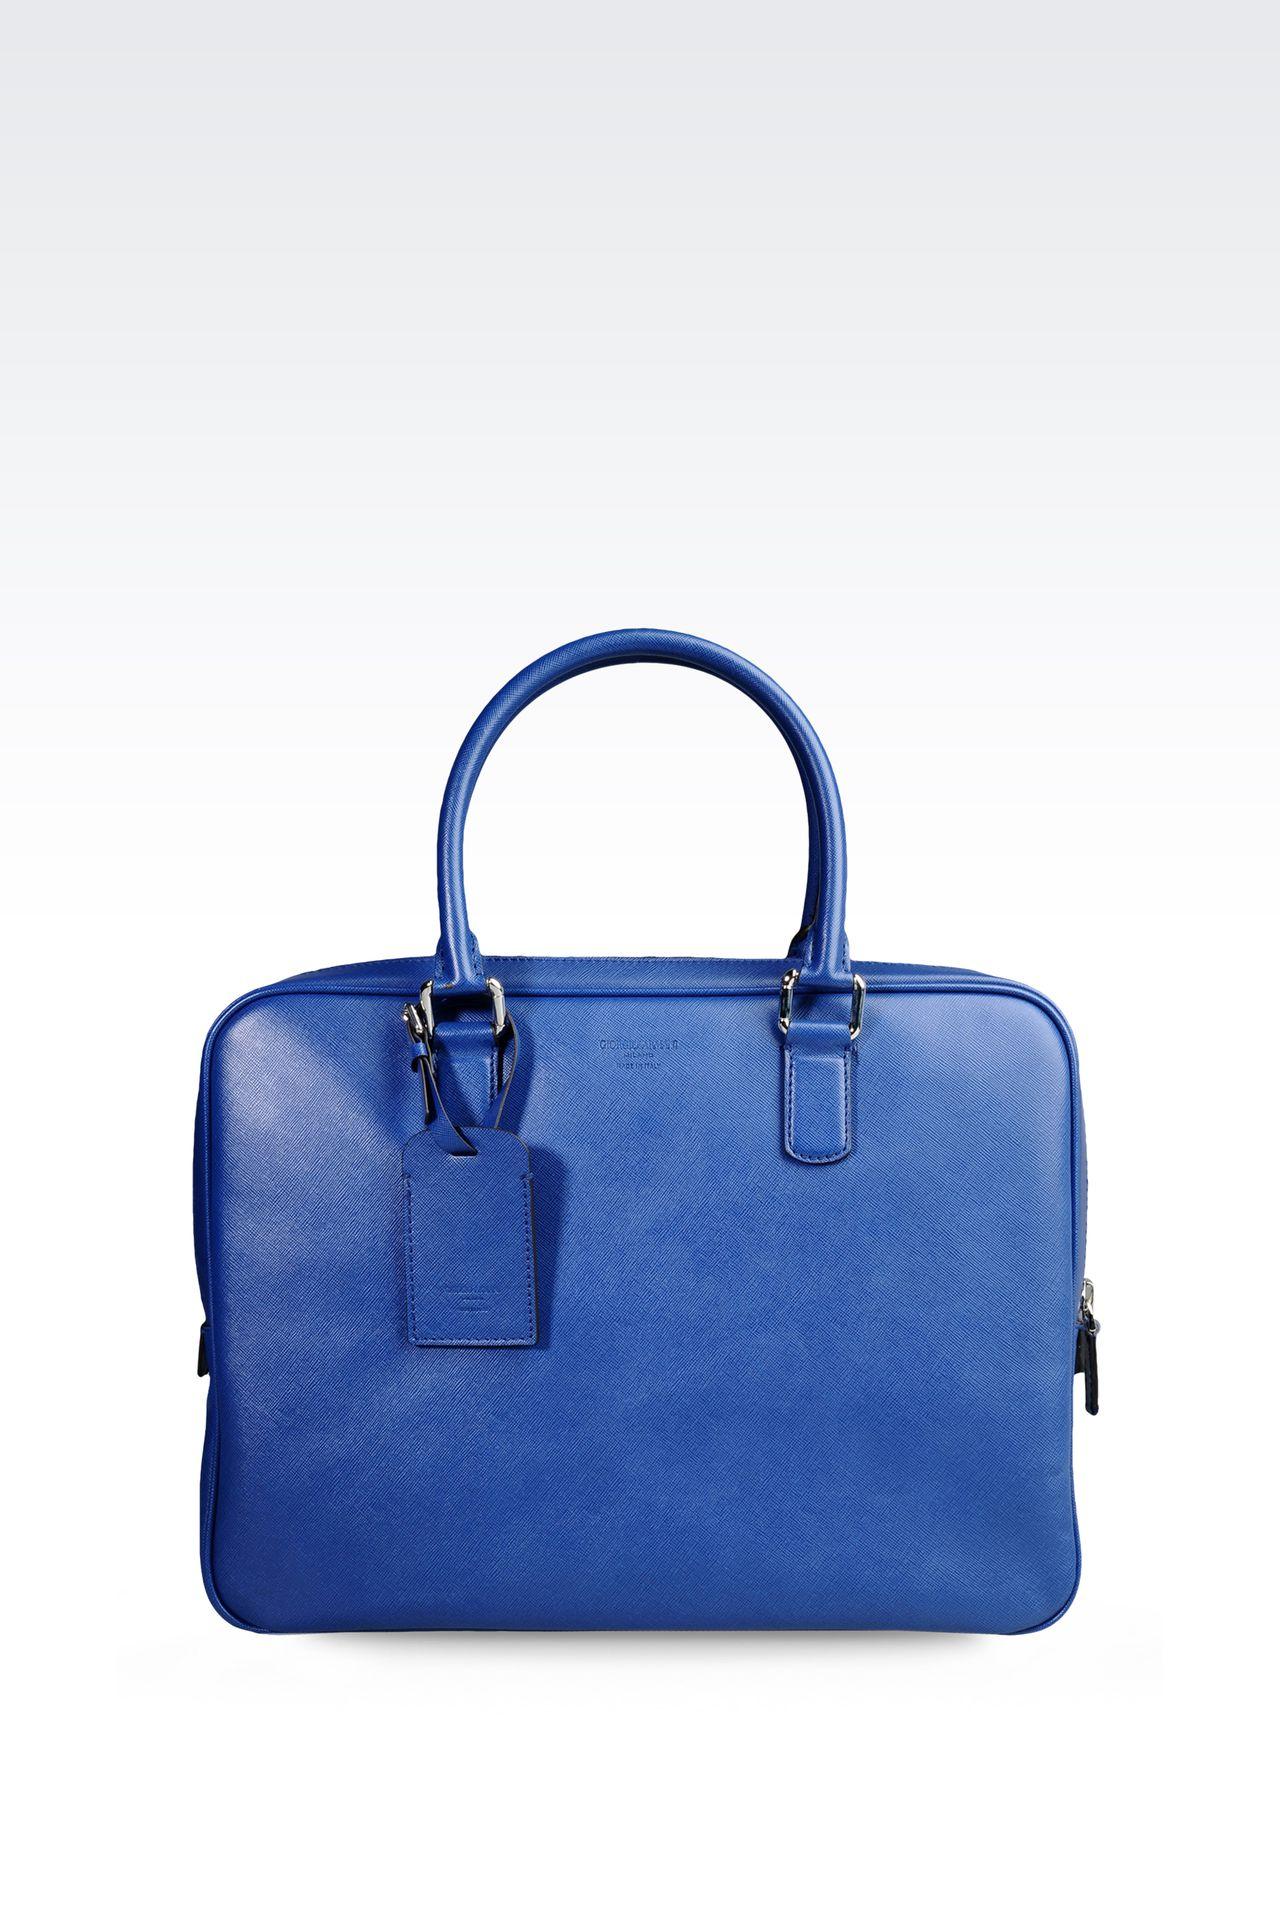 BRIEFCASE IN SAFFIANO CALFSKIN: Briefcases Men by Armani - 0